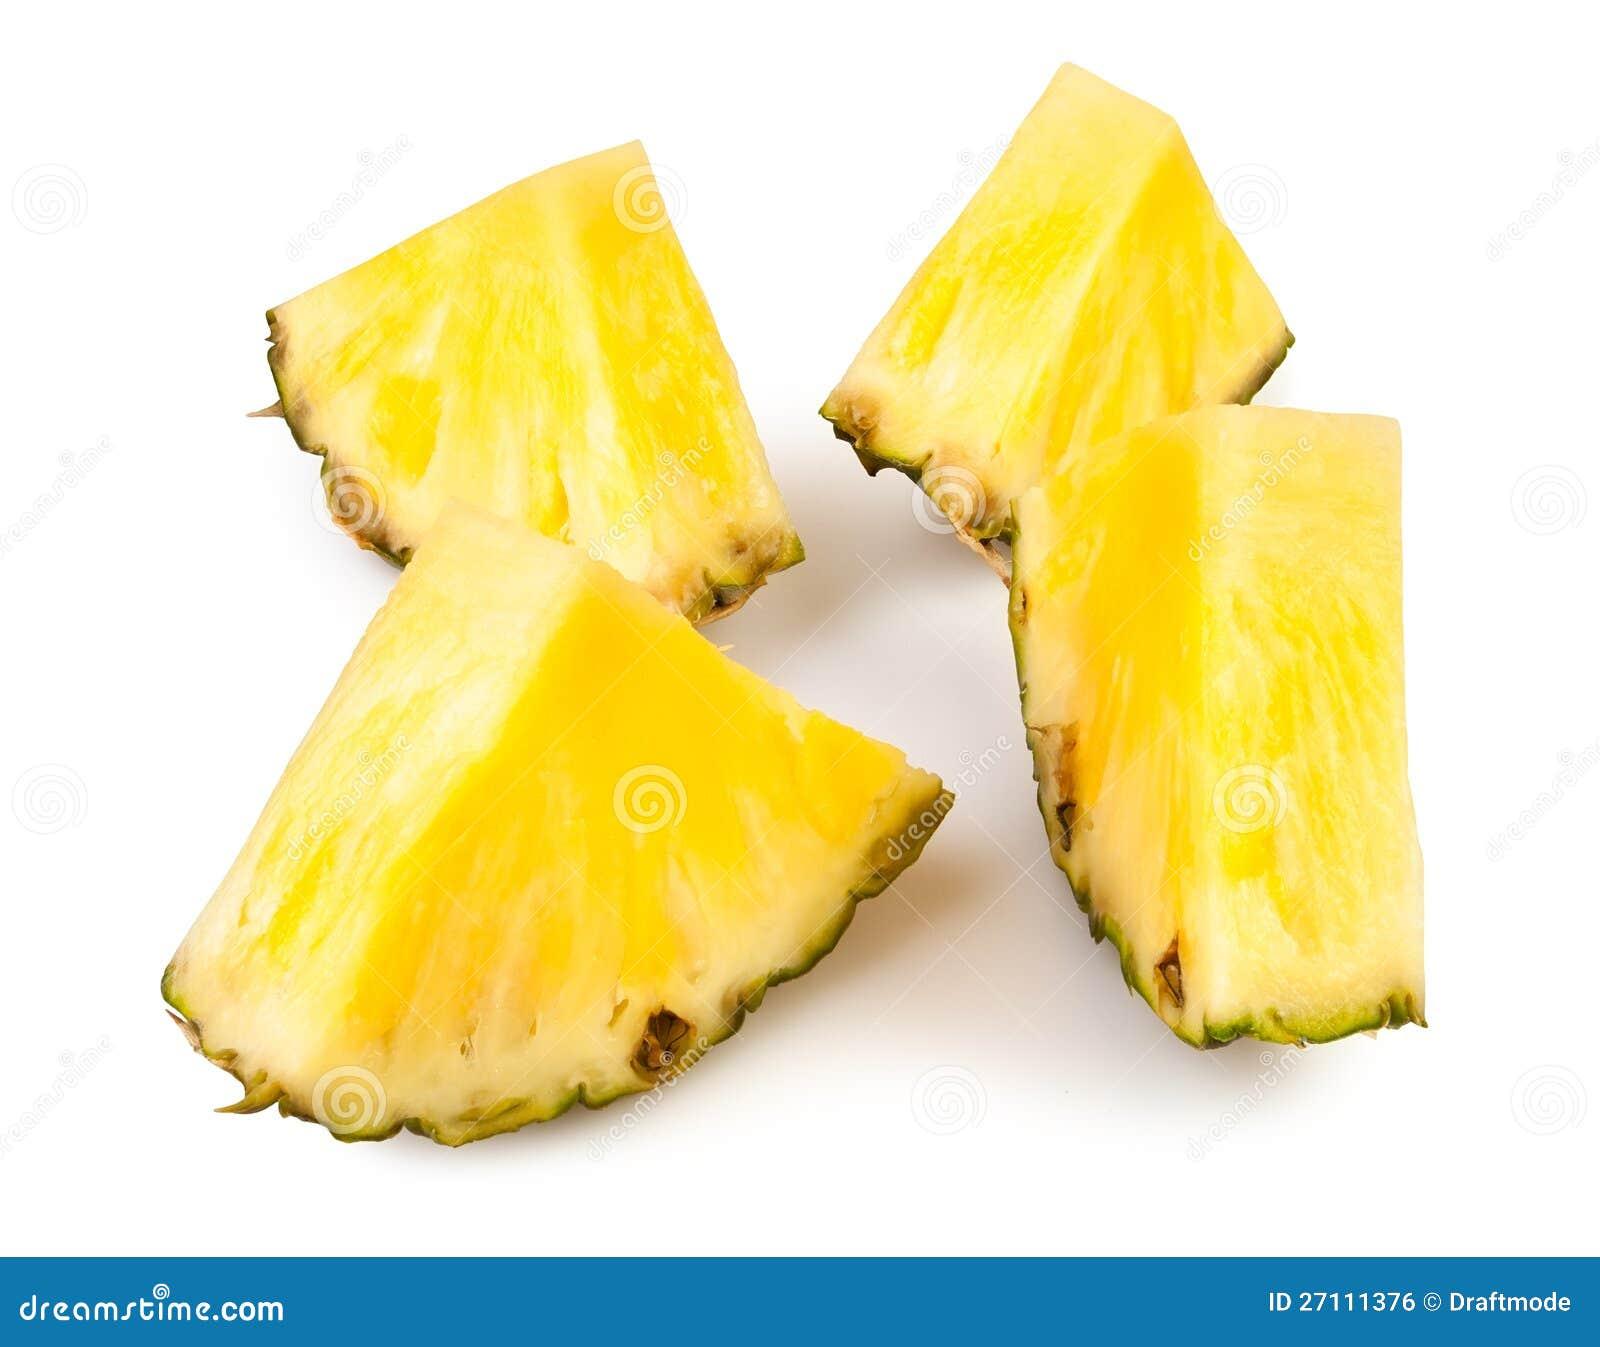 Ananasklumpen